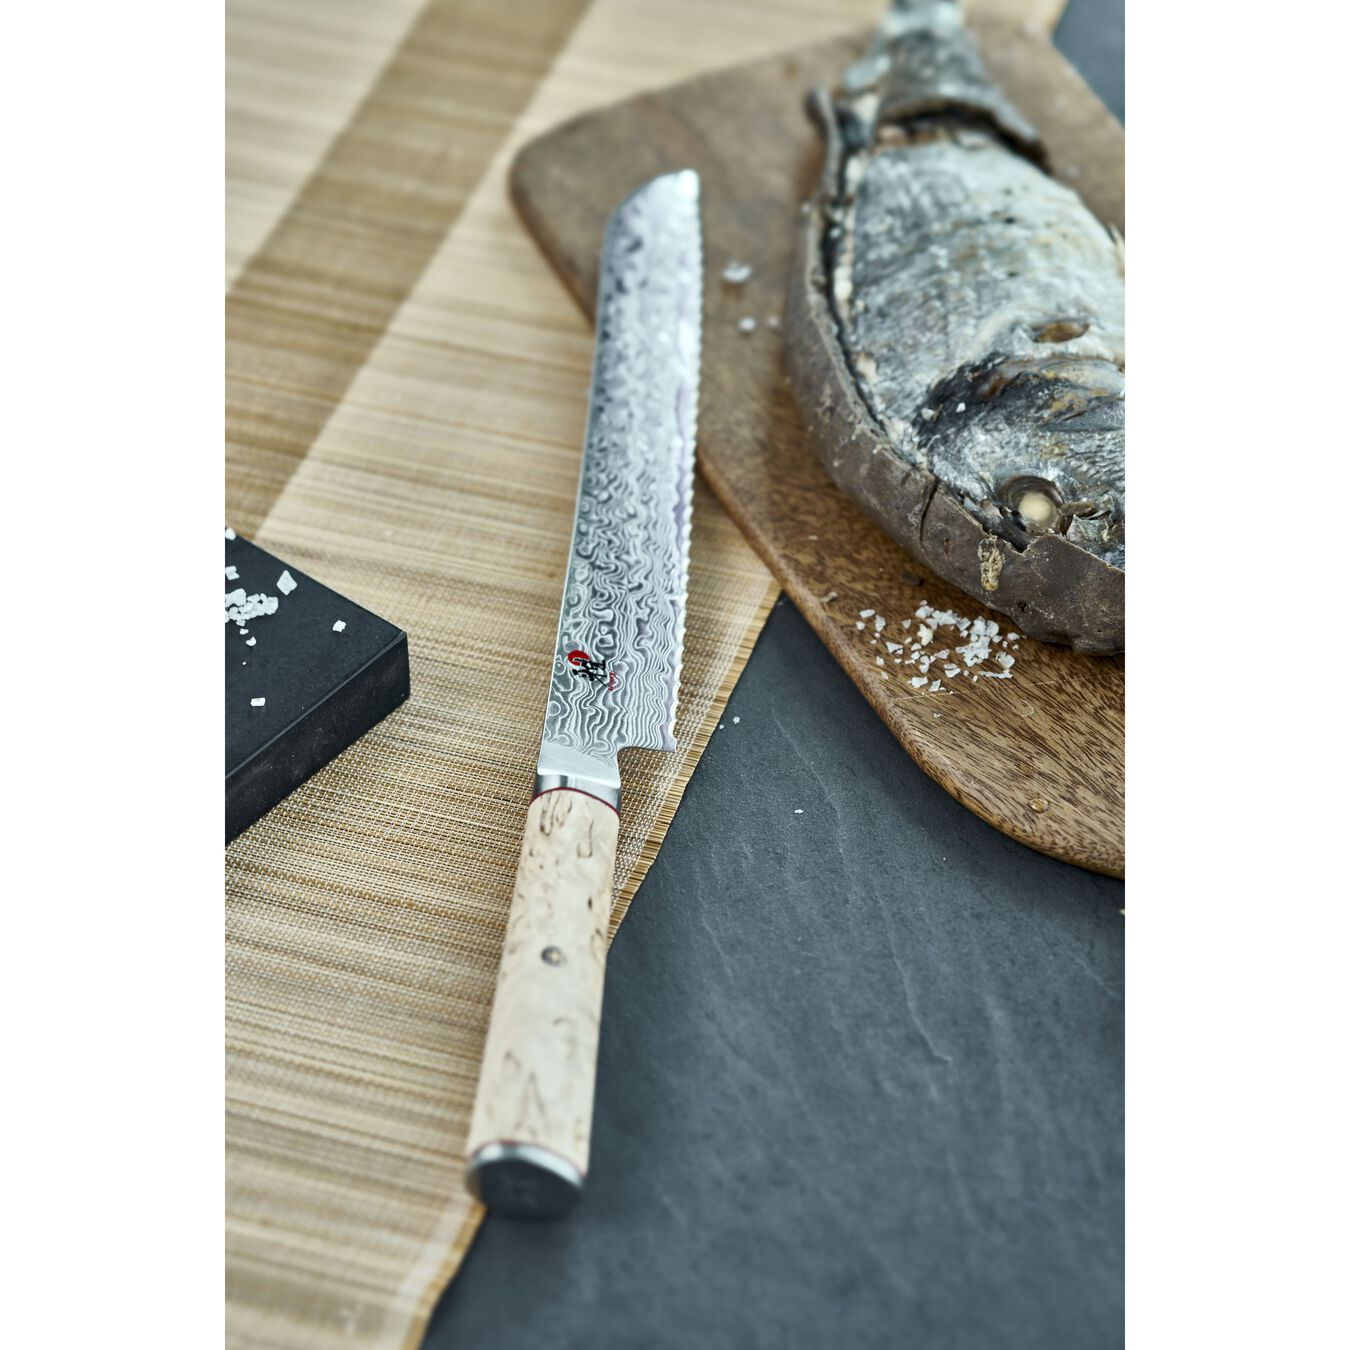 Brotmesser 23 cm, Birke,,large 2